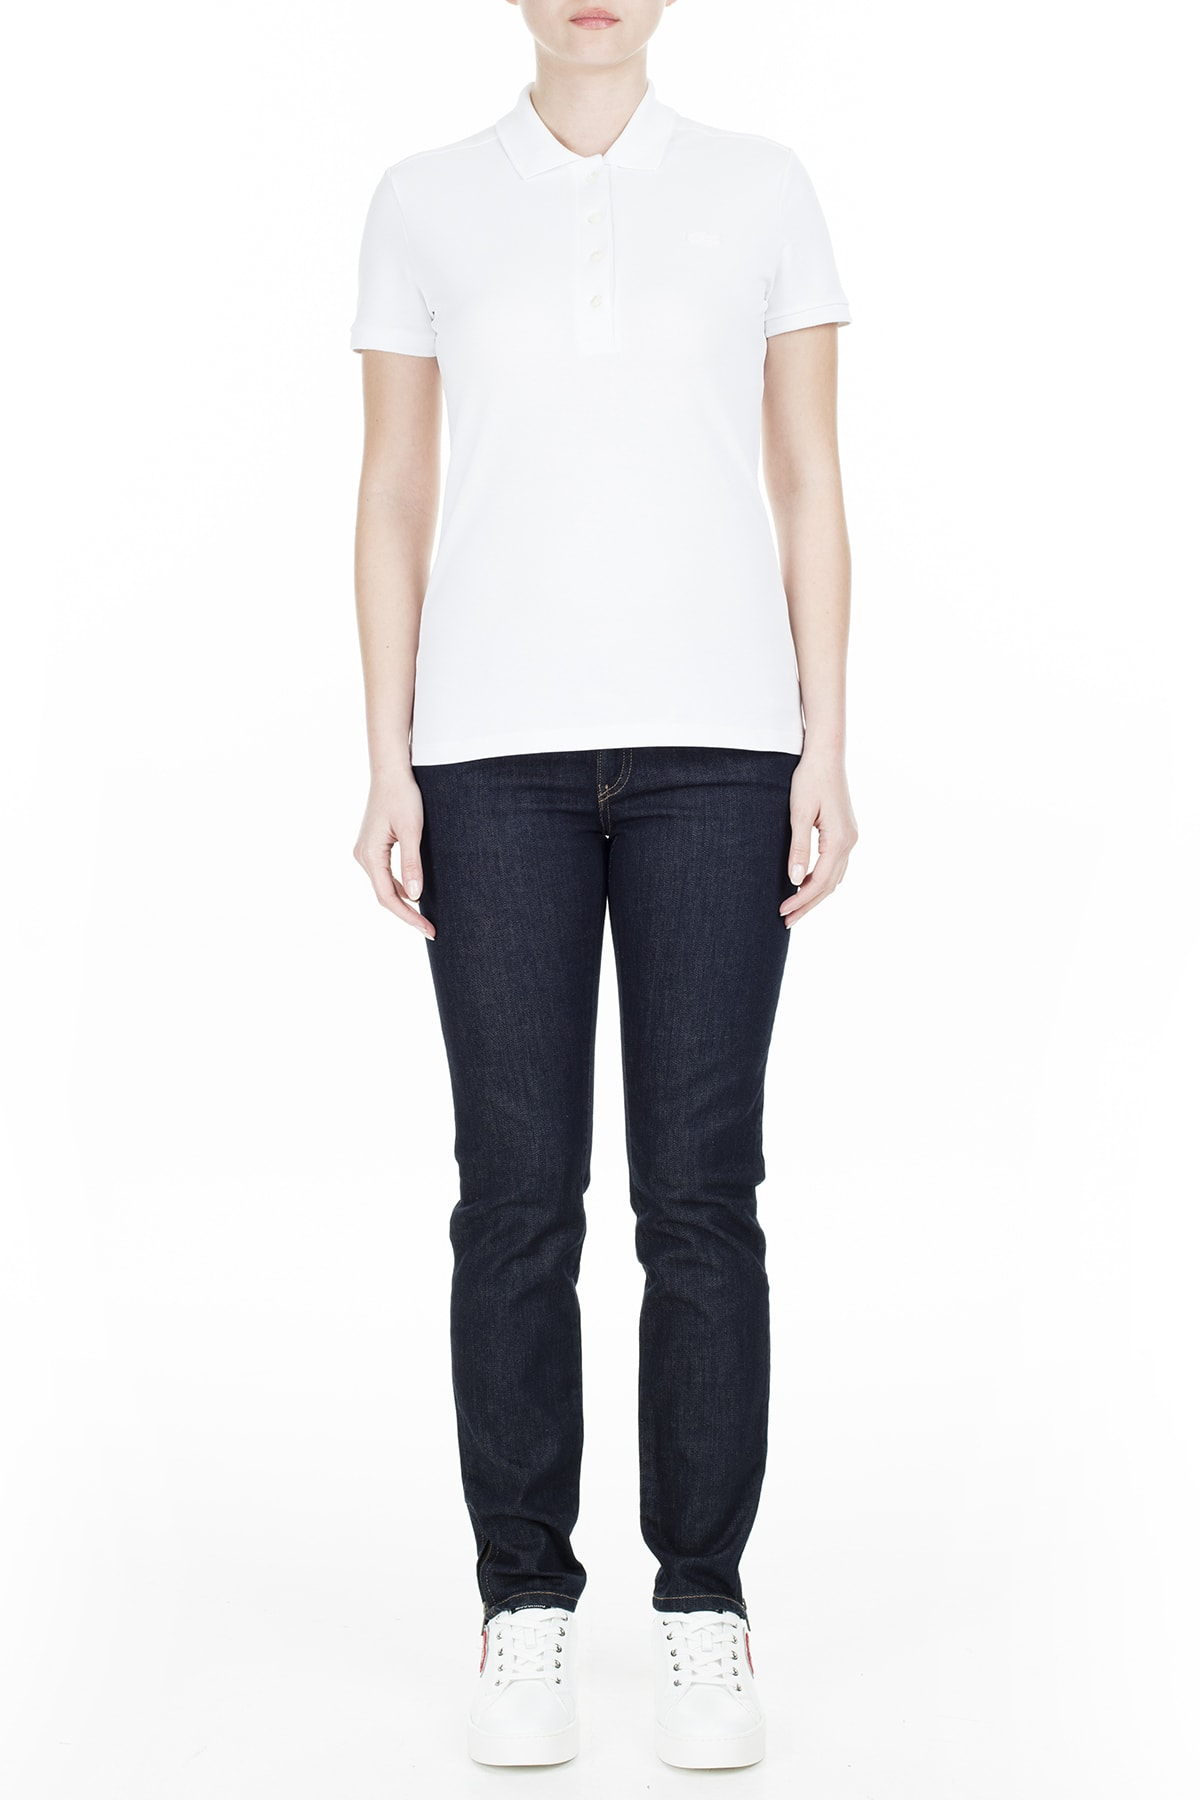 Replay Jeans Kadın Kot Pantolon Zoxwv554